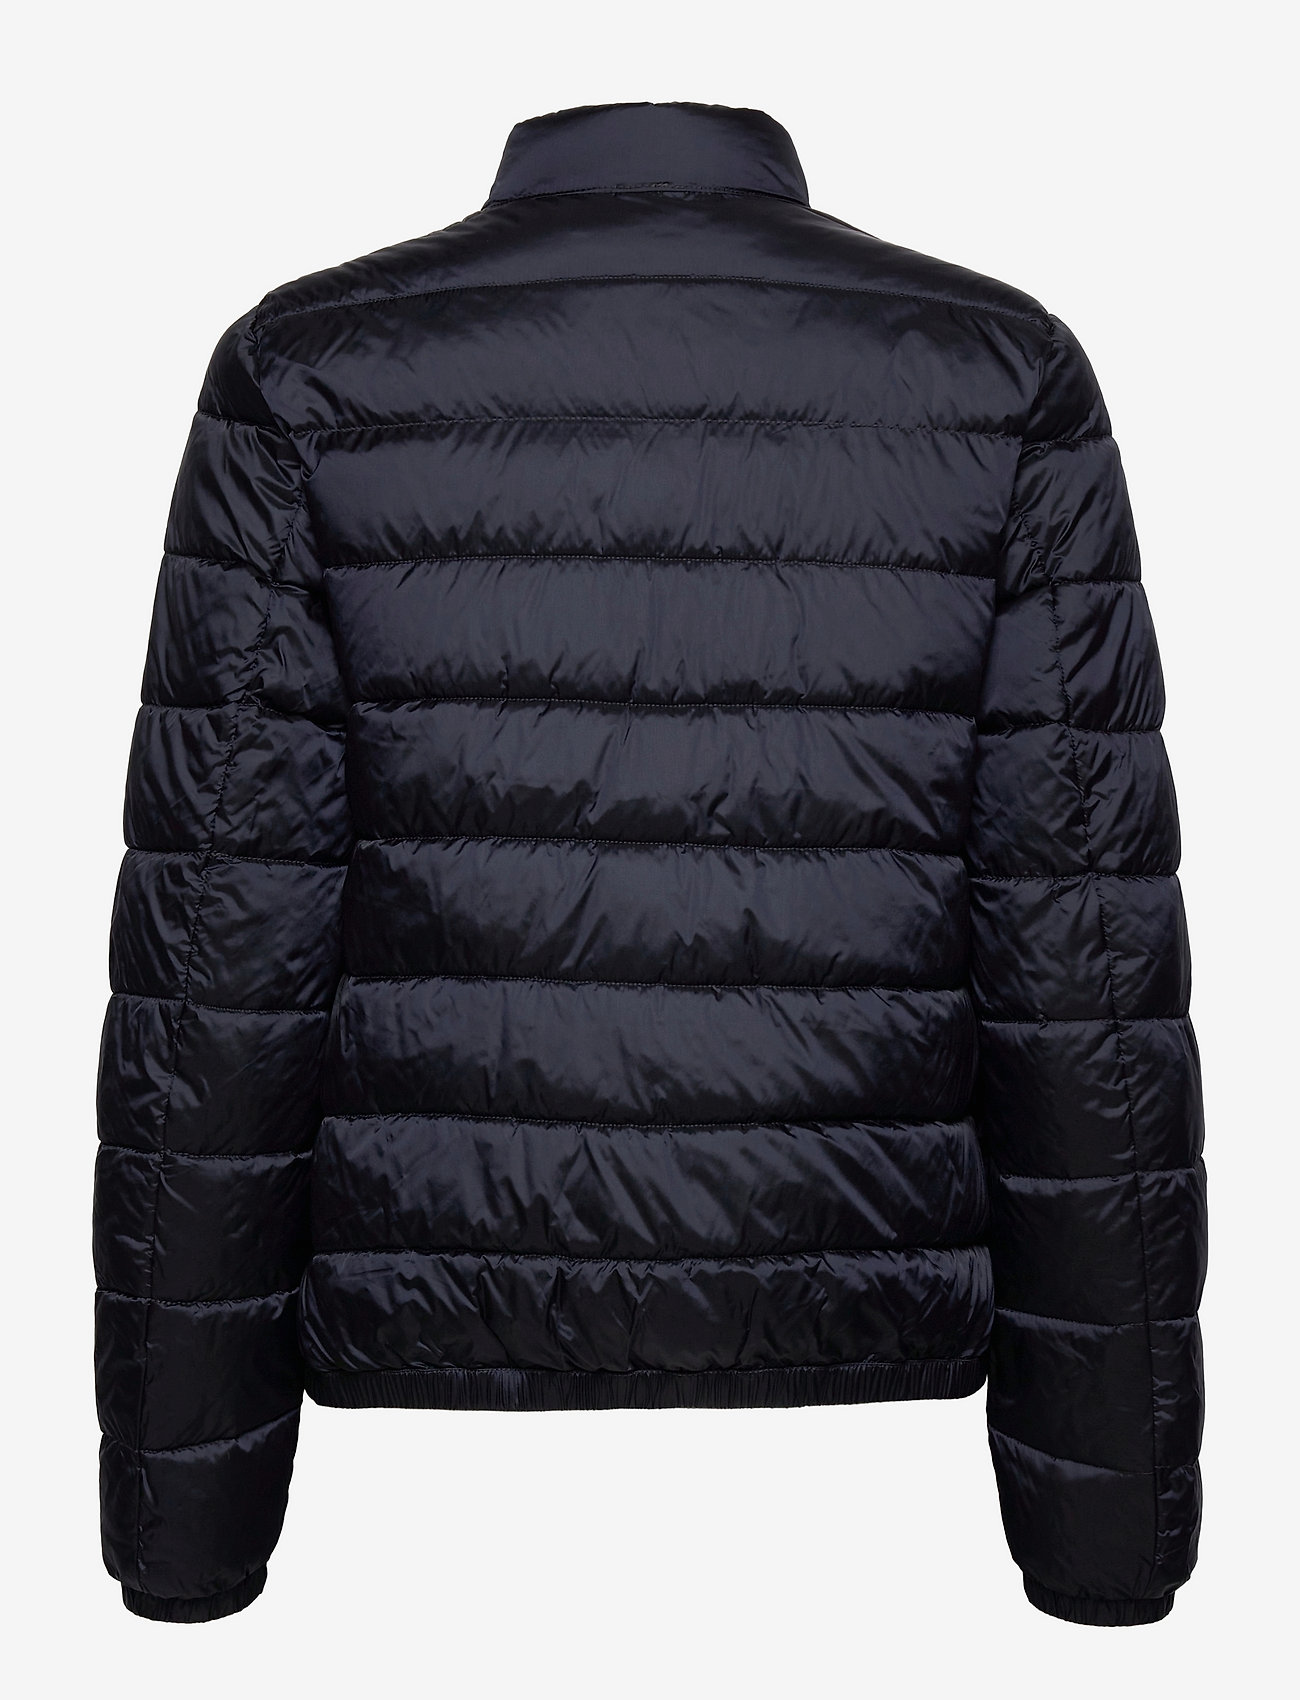 Tommy Hilfiger - NYLON LW PADDED JACKET - winter jackets - desert sky - 1